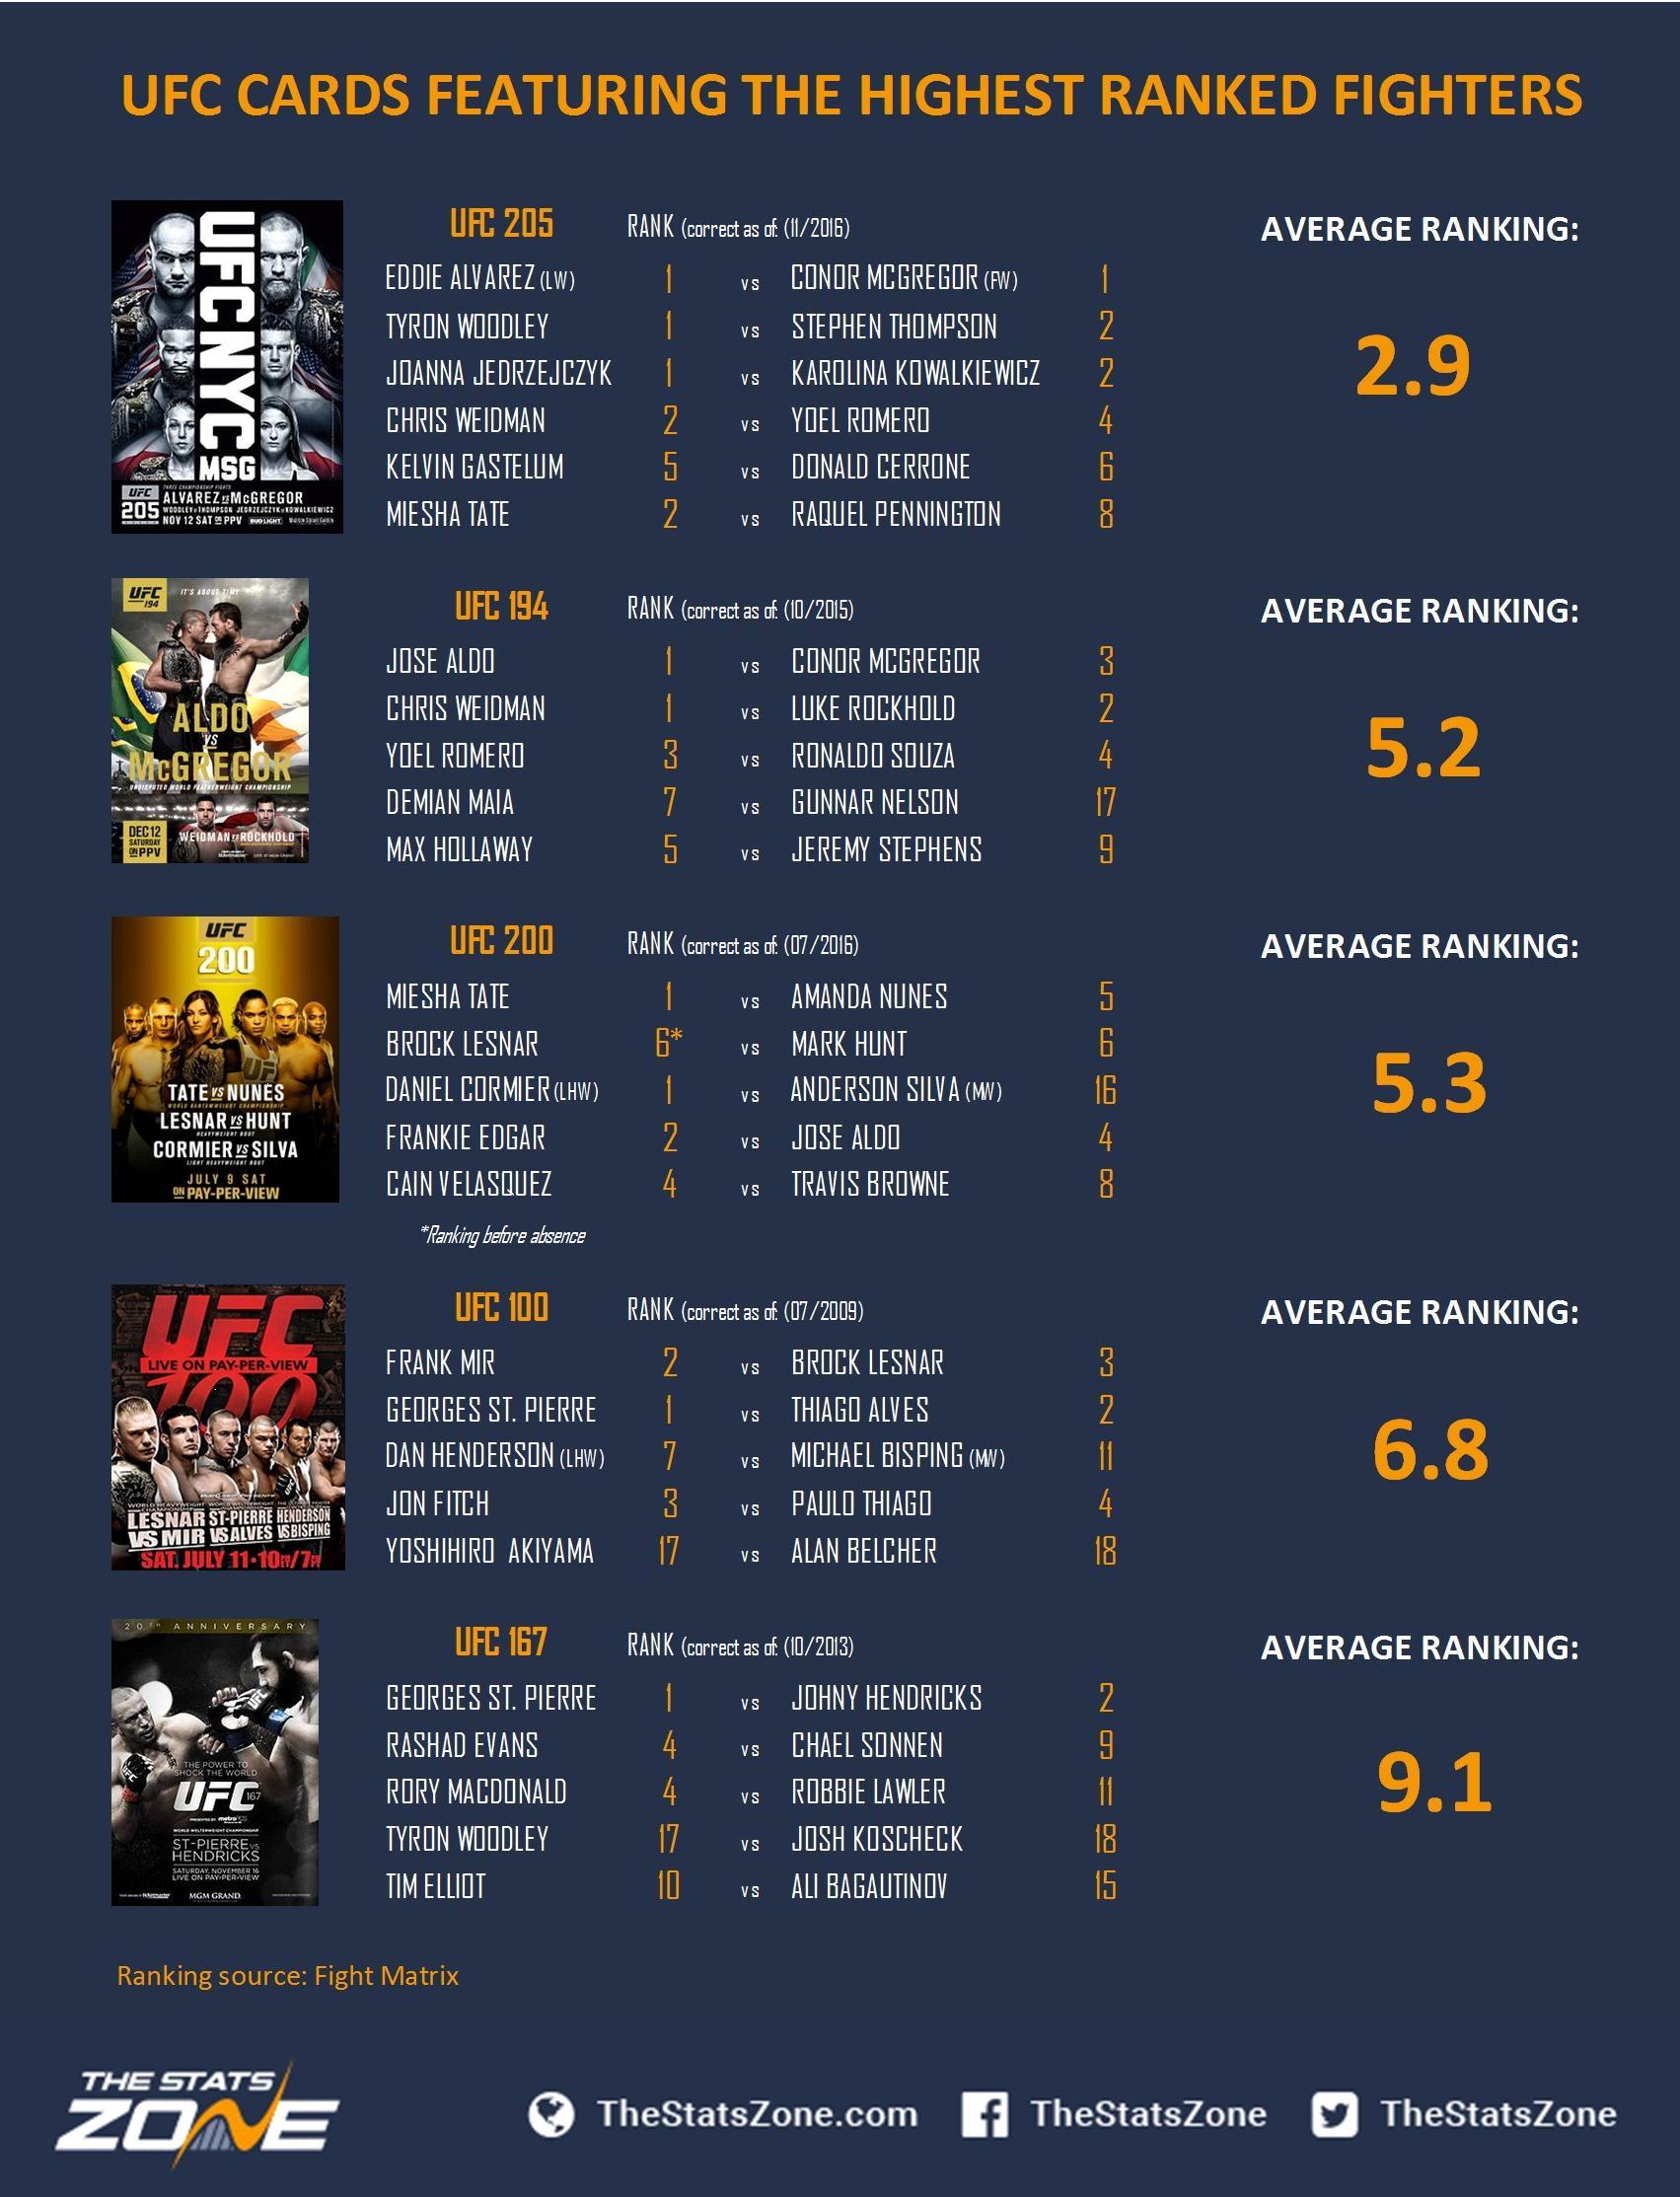 Fight card rankings